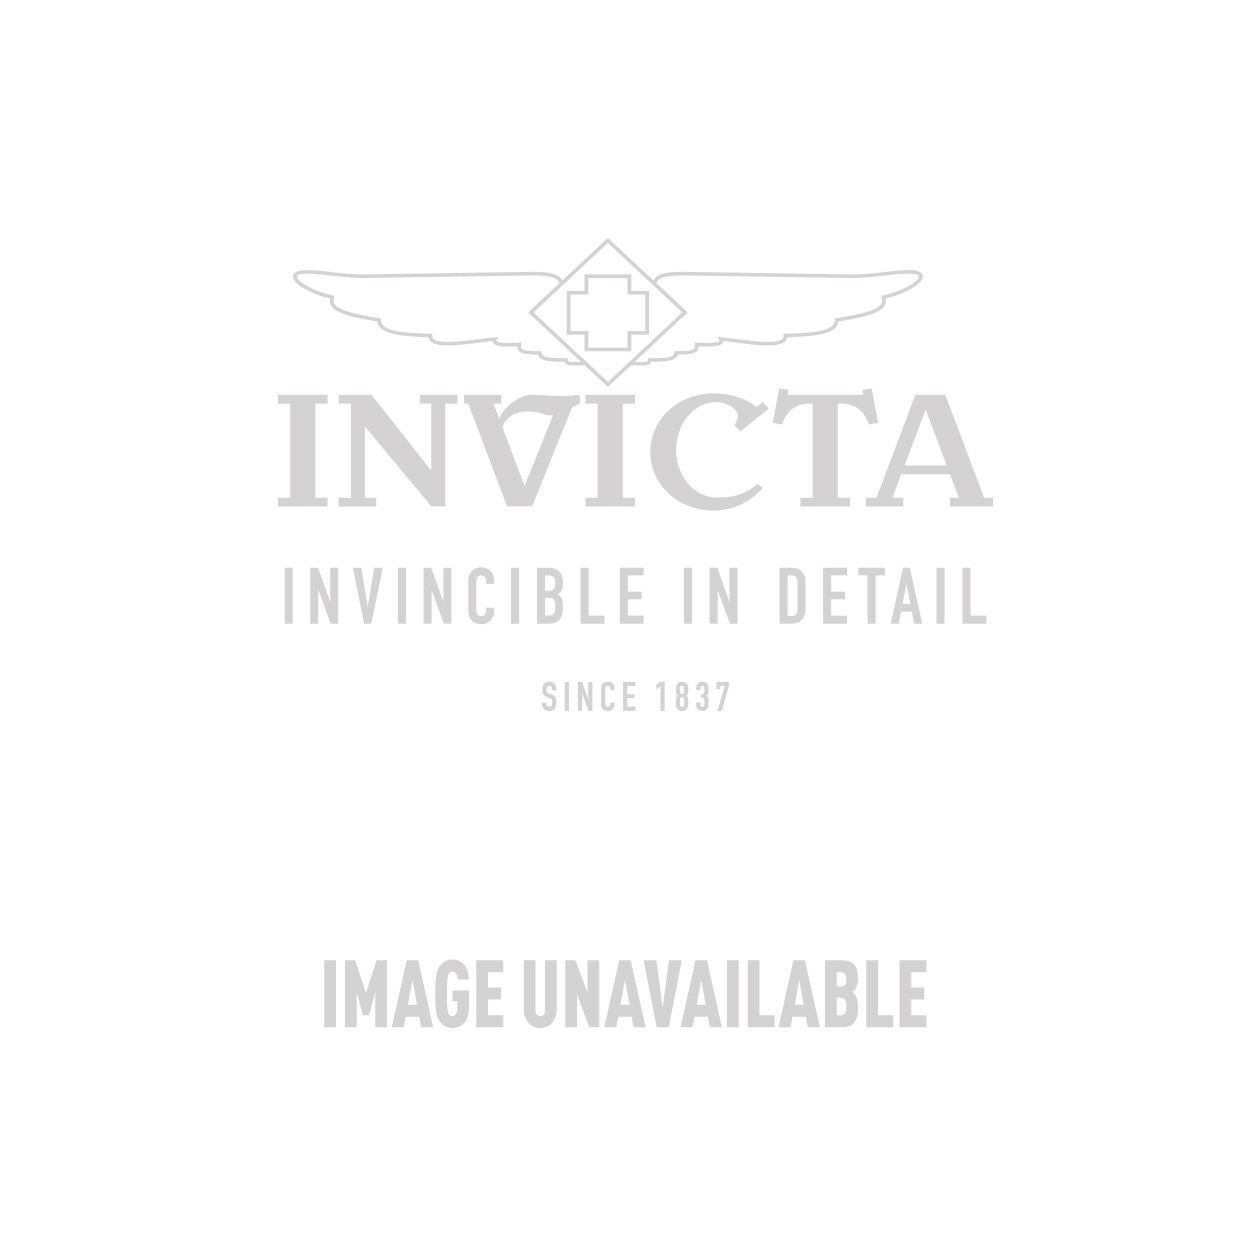 Invicta Bolt Swiss Made Quartz Watch - Black, Orange case with Black, Orange tone Stainless Steel band - Model 14061